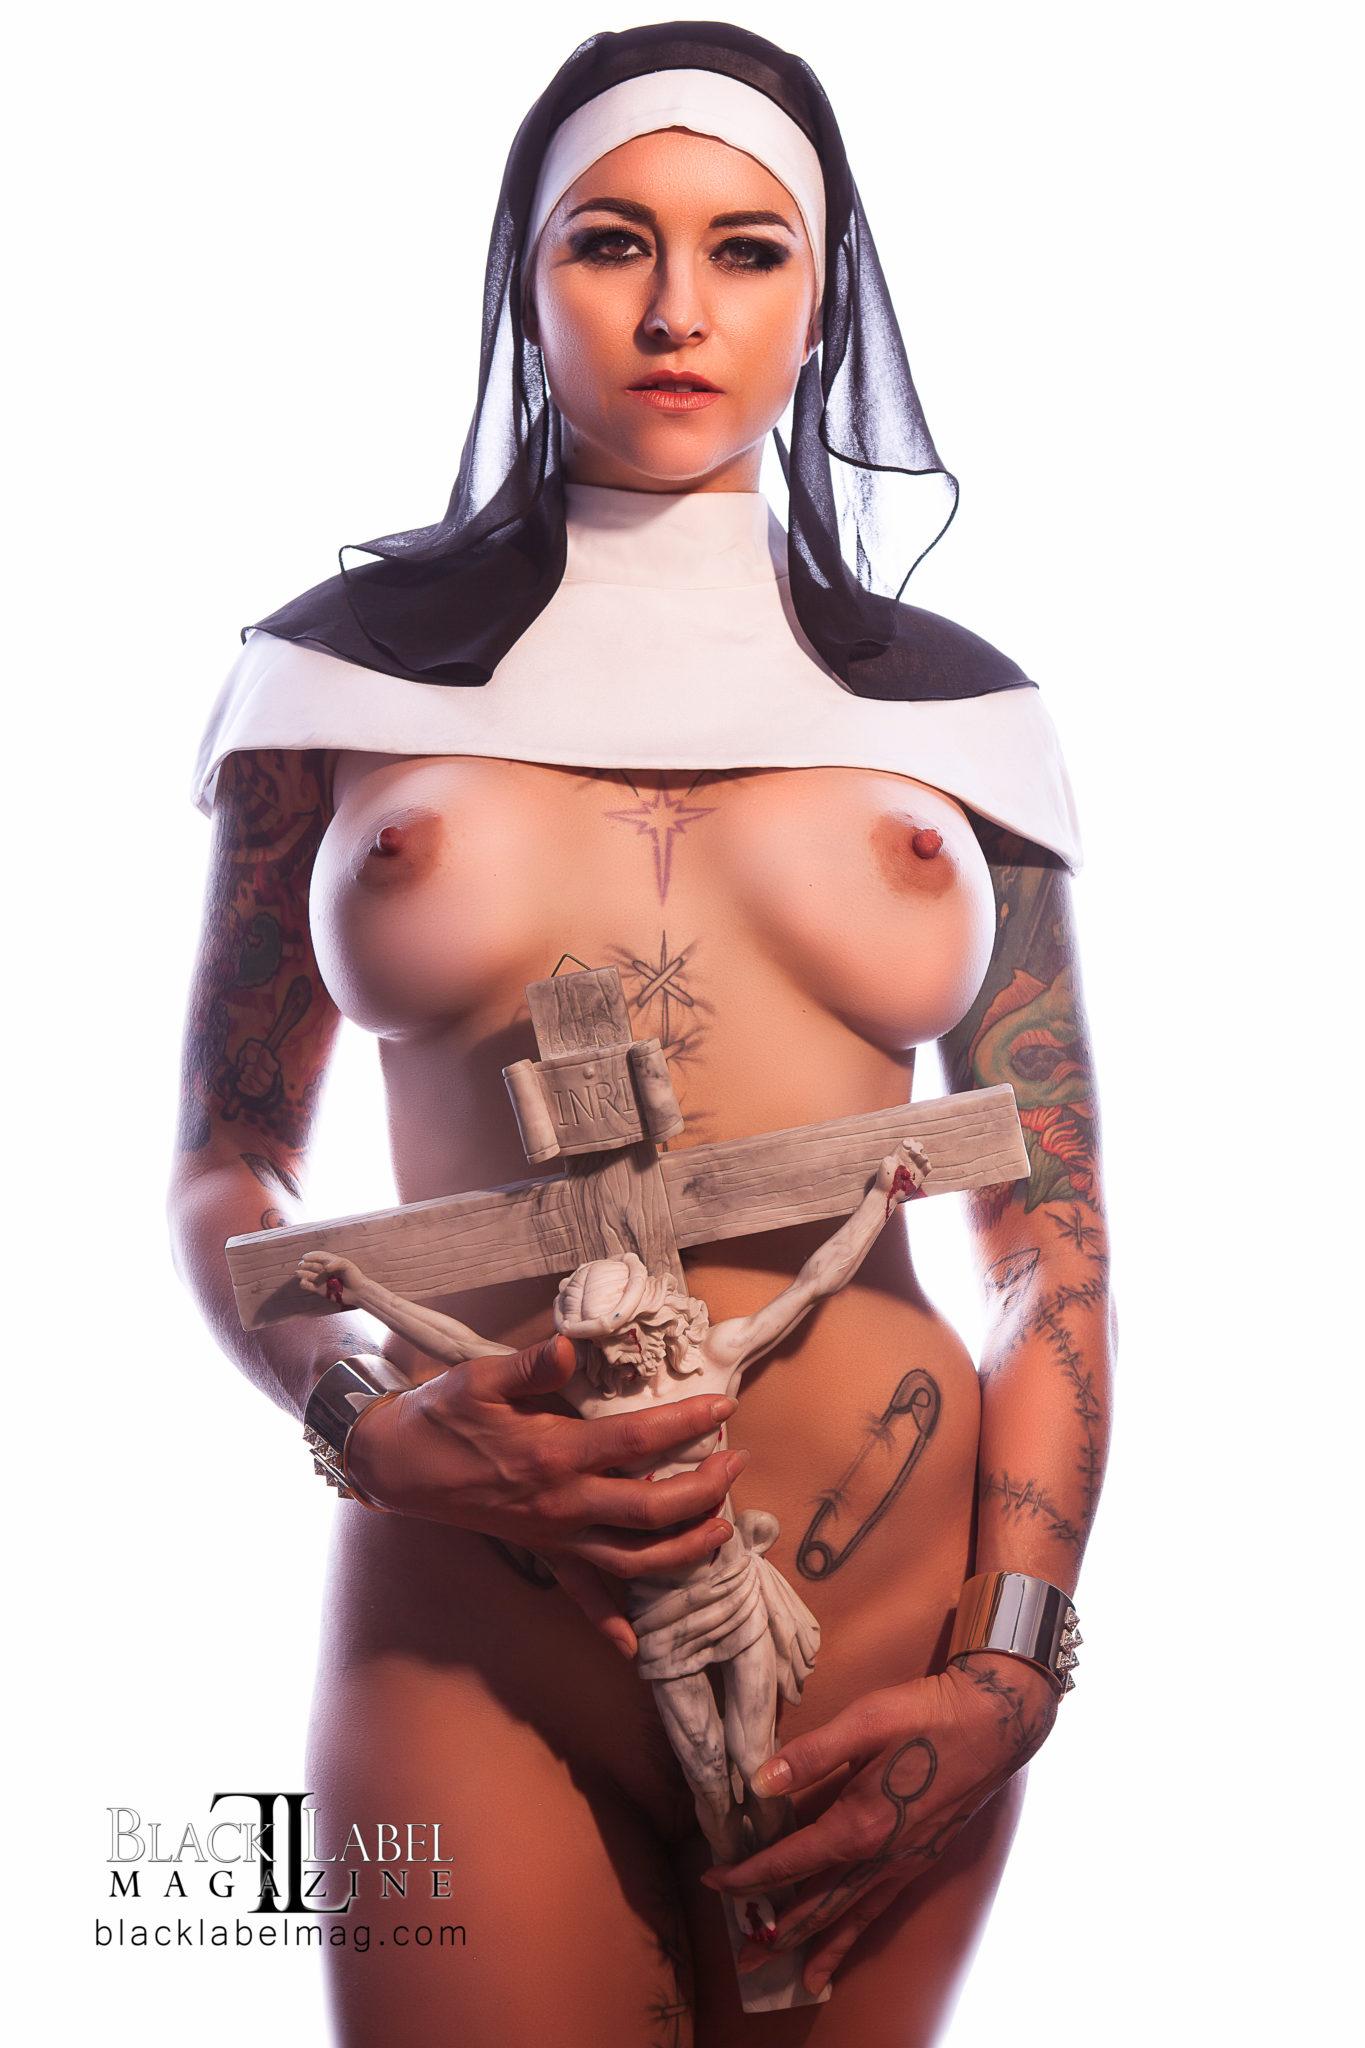 nun porn, big tits, Ivizia Dakini, nude models, nude art, Black Label Magazine